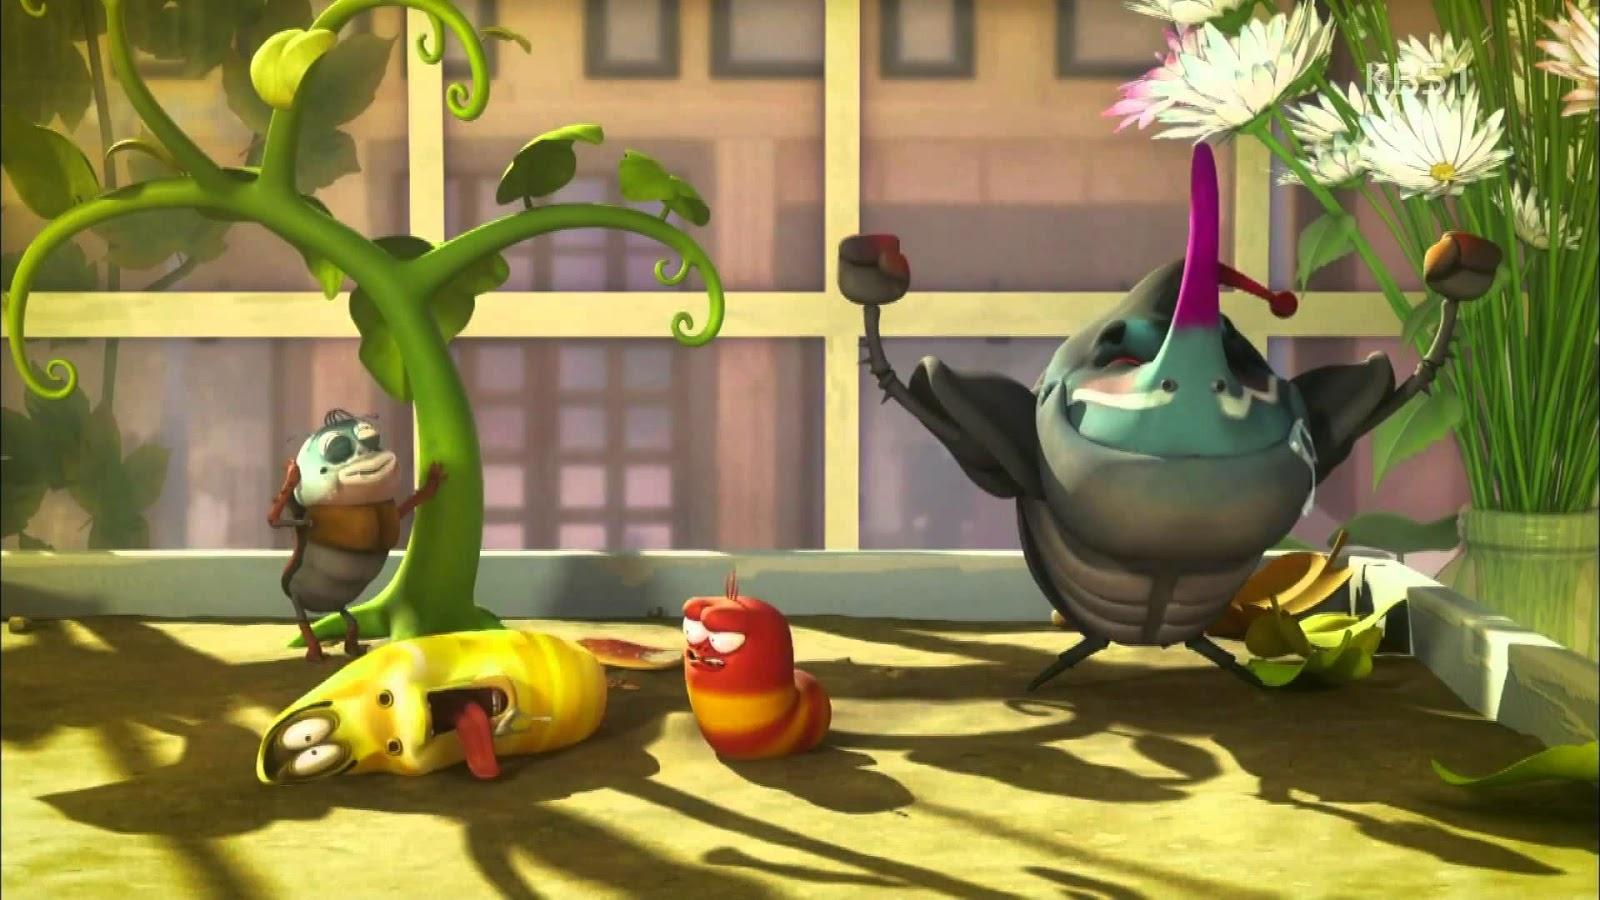 gambar ketupat animasi to download gambar ketupat animasi just right ...